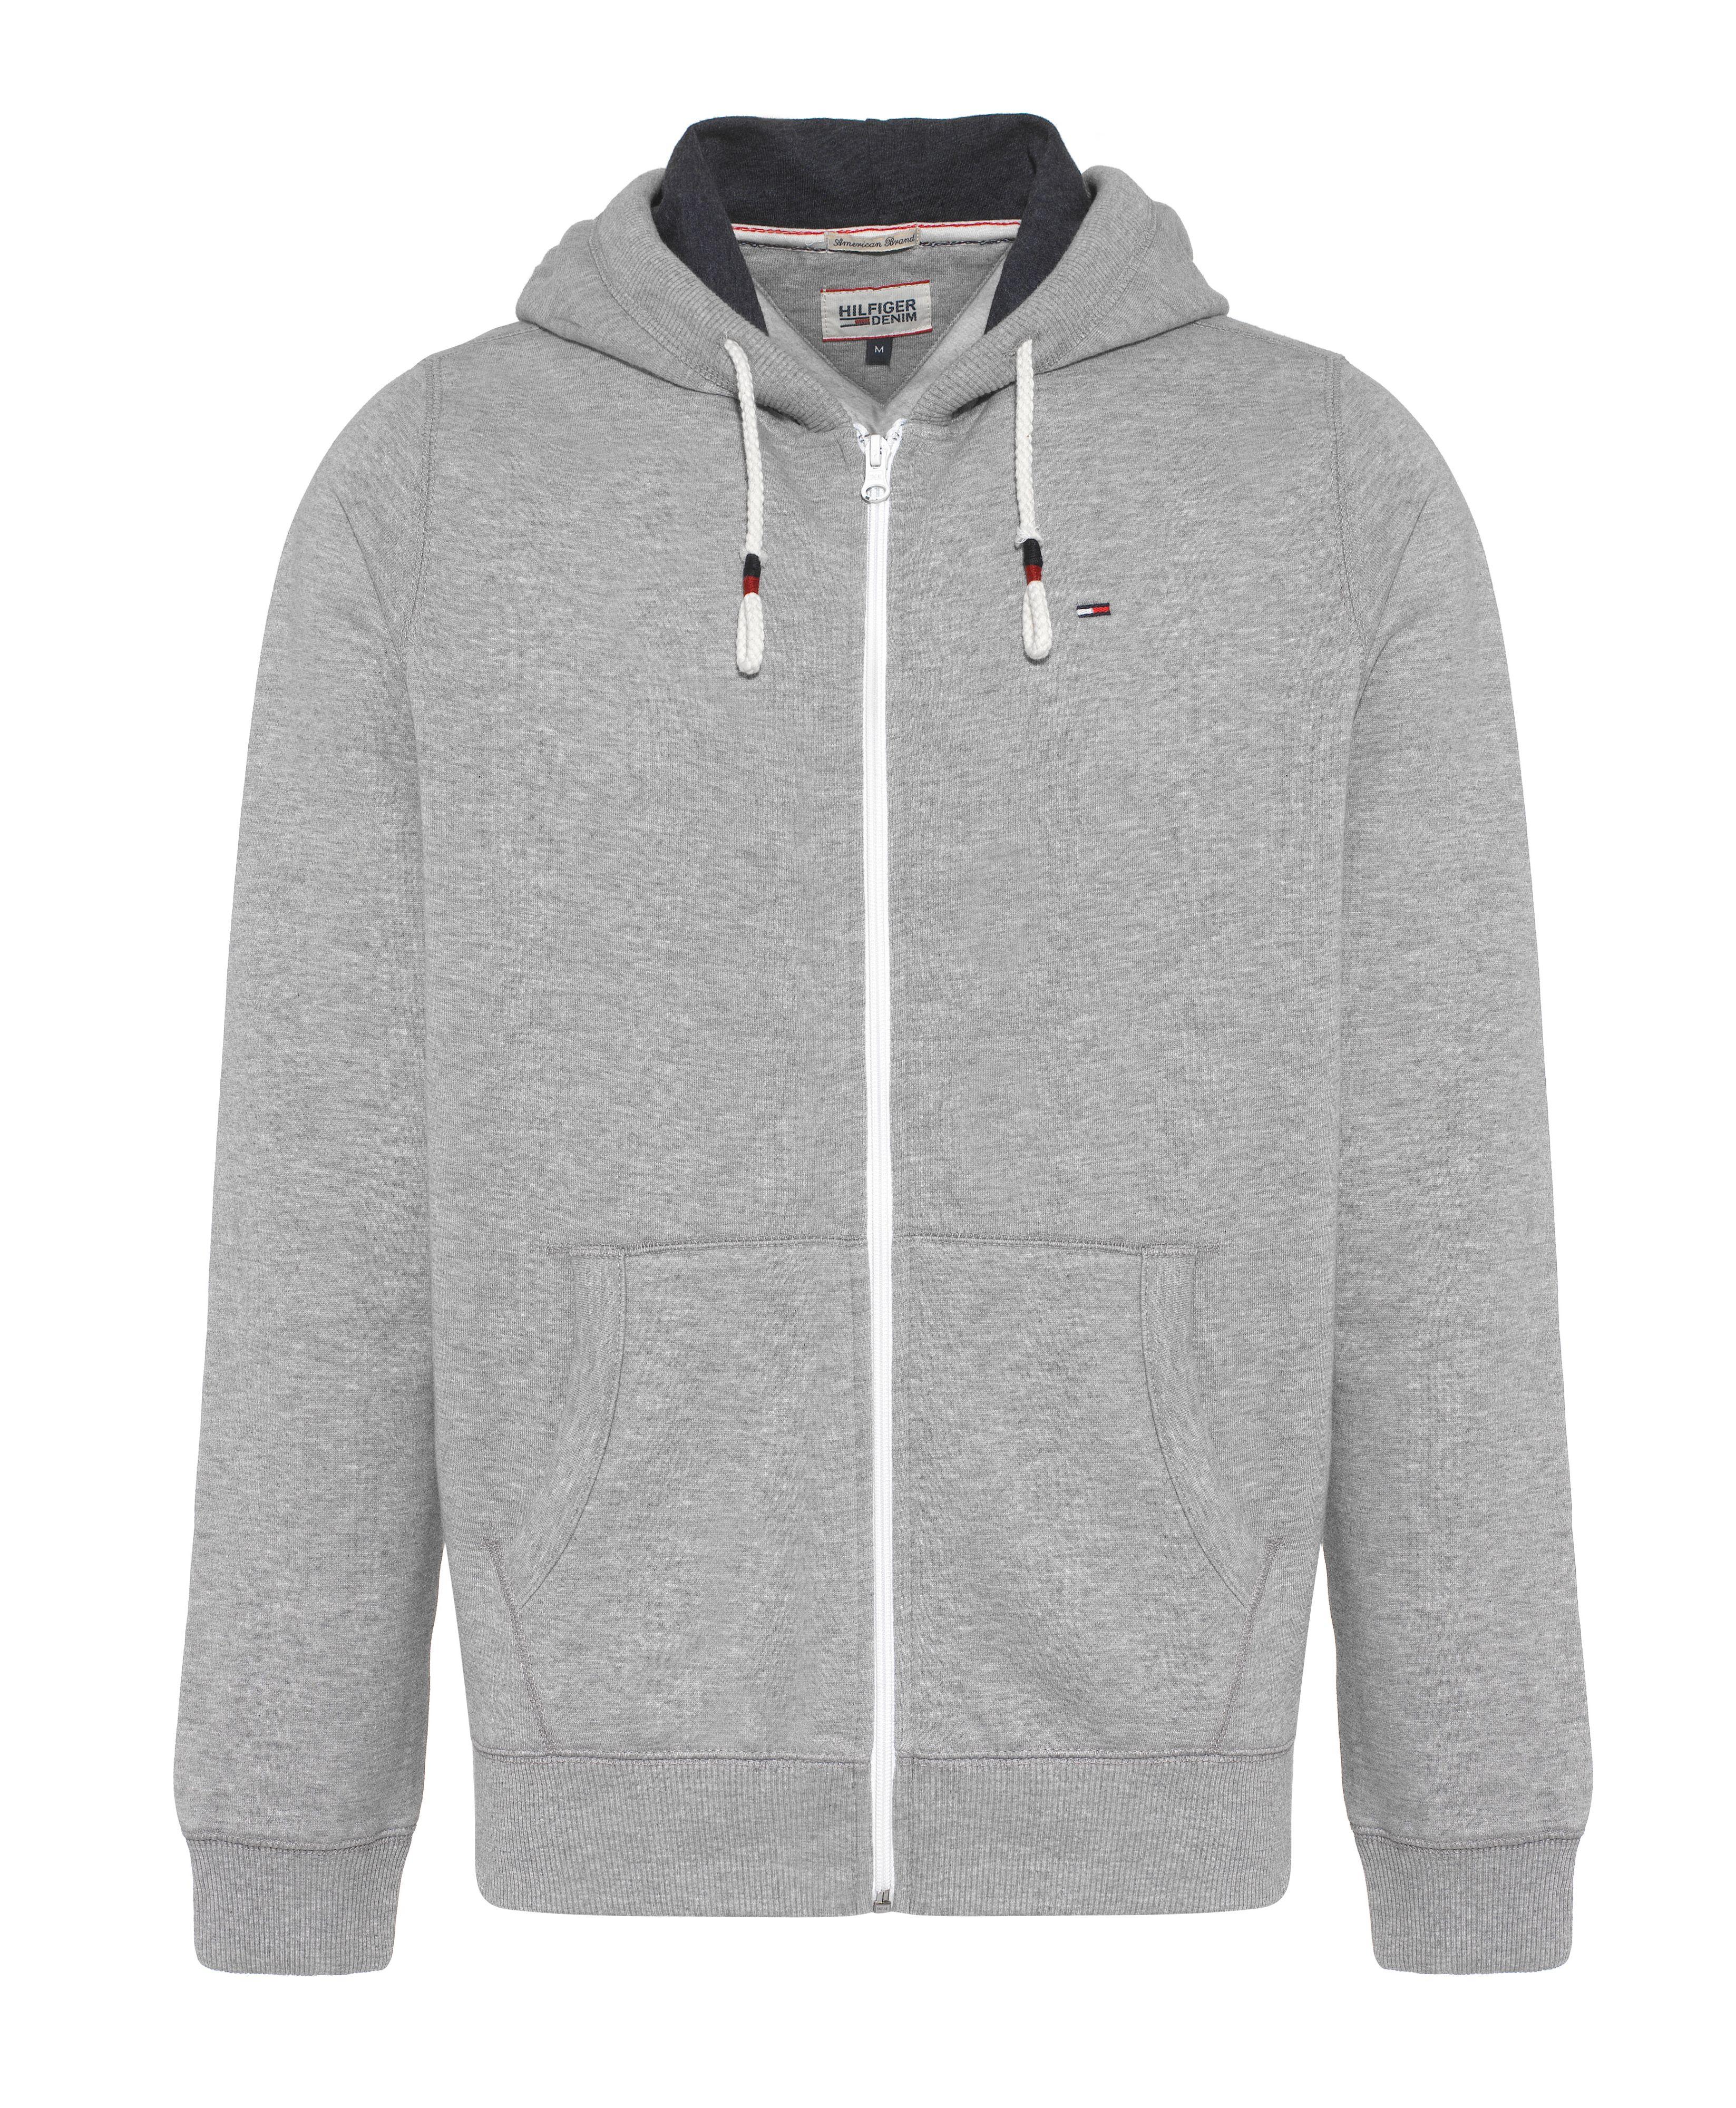 tommy hilfiger vaco plain crew neck zip fastening hoodie in gray for men lyst. Black Bedroom Furniture Sets. Home Design Ideas